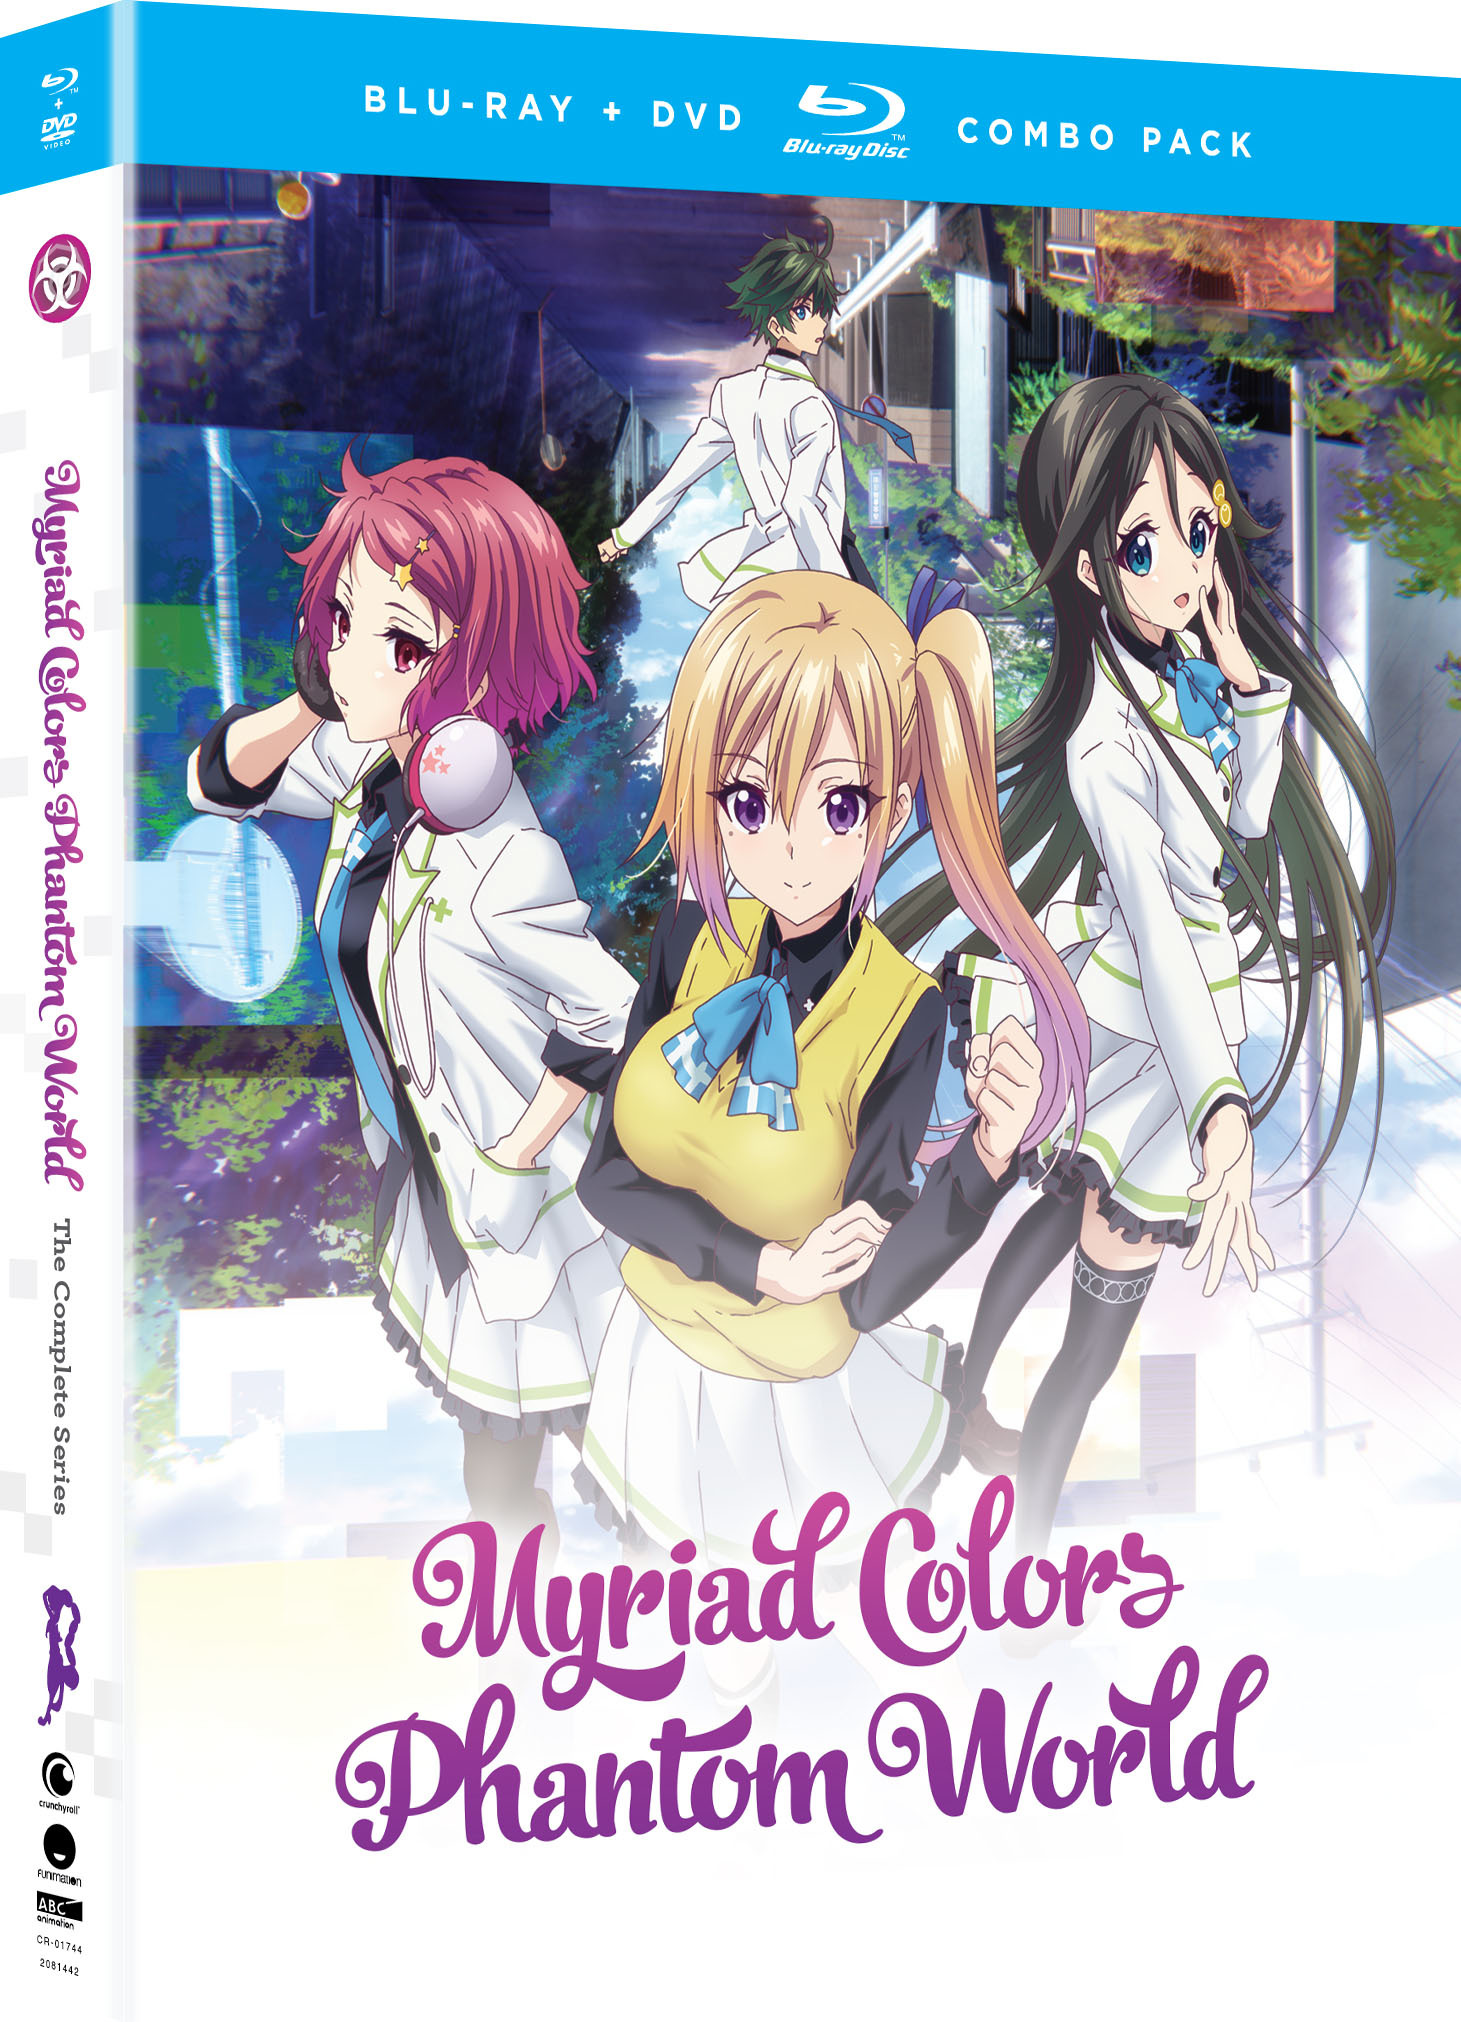 Myriad Colors Phantom World Blu-ray/DVD